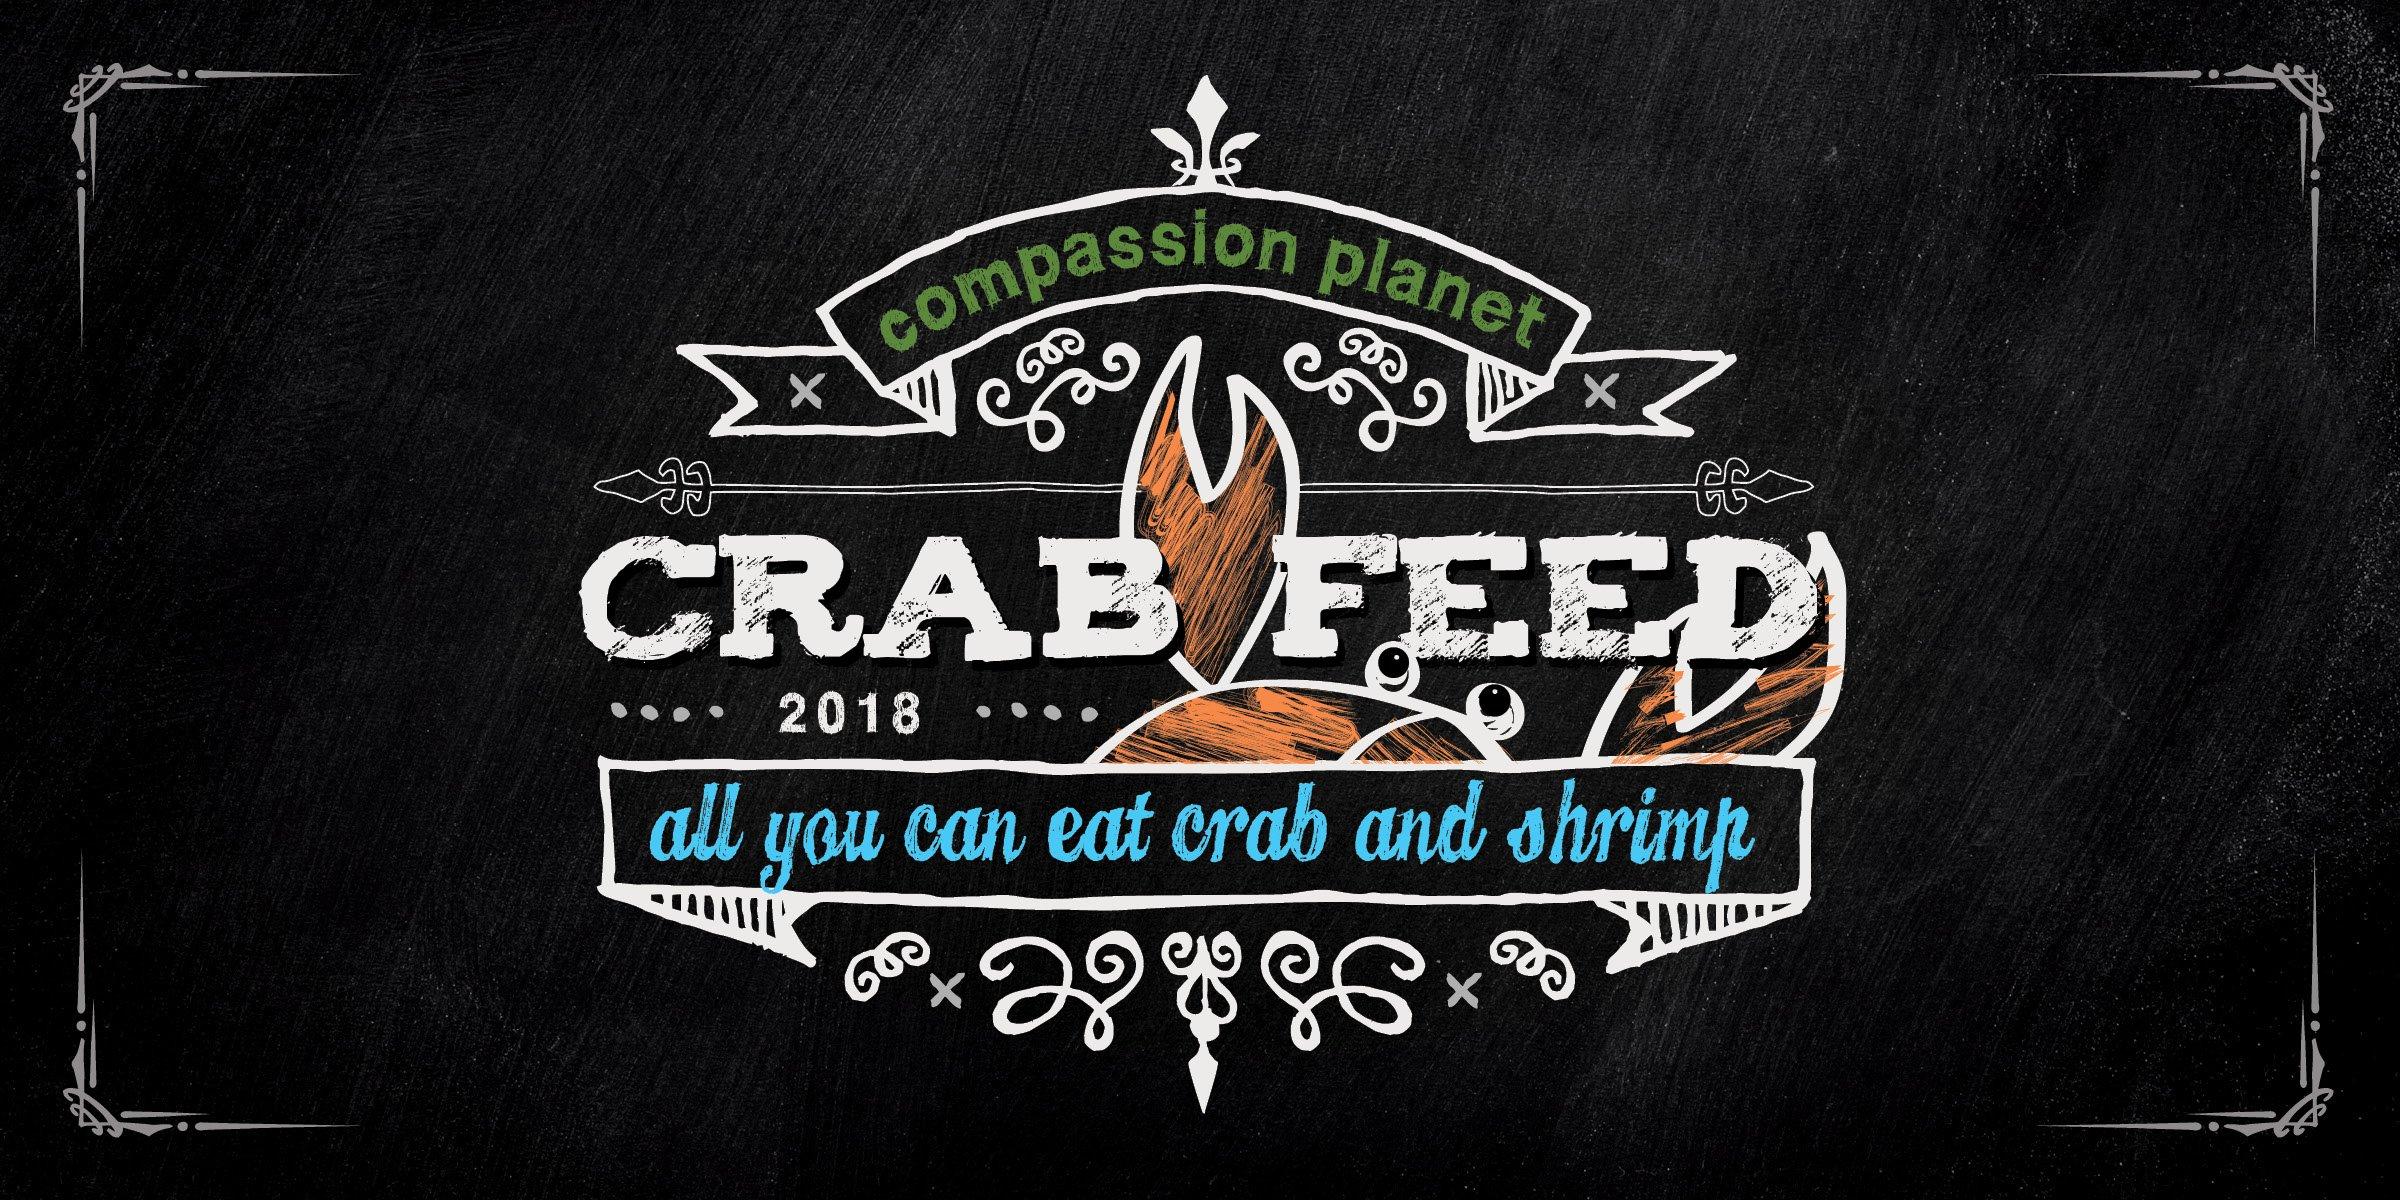 Annual Crab Feed